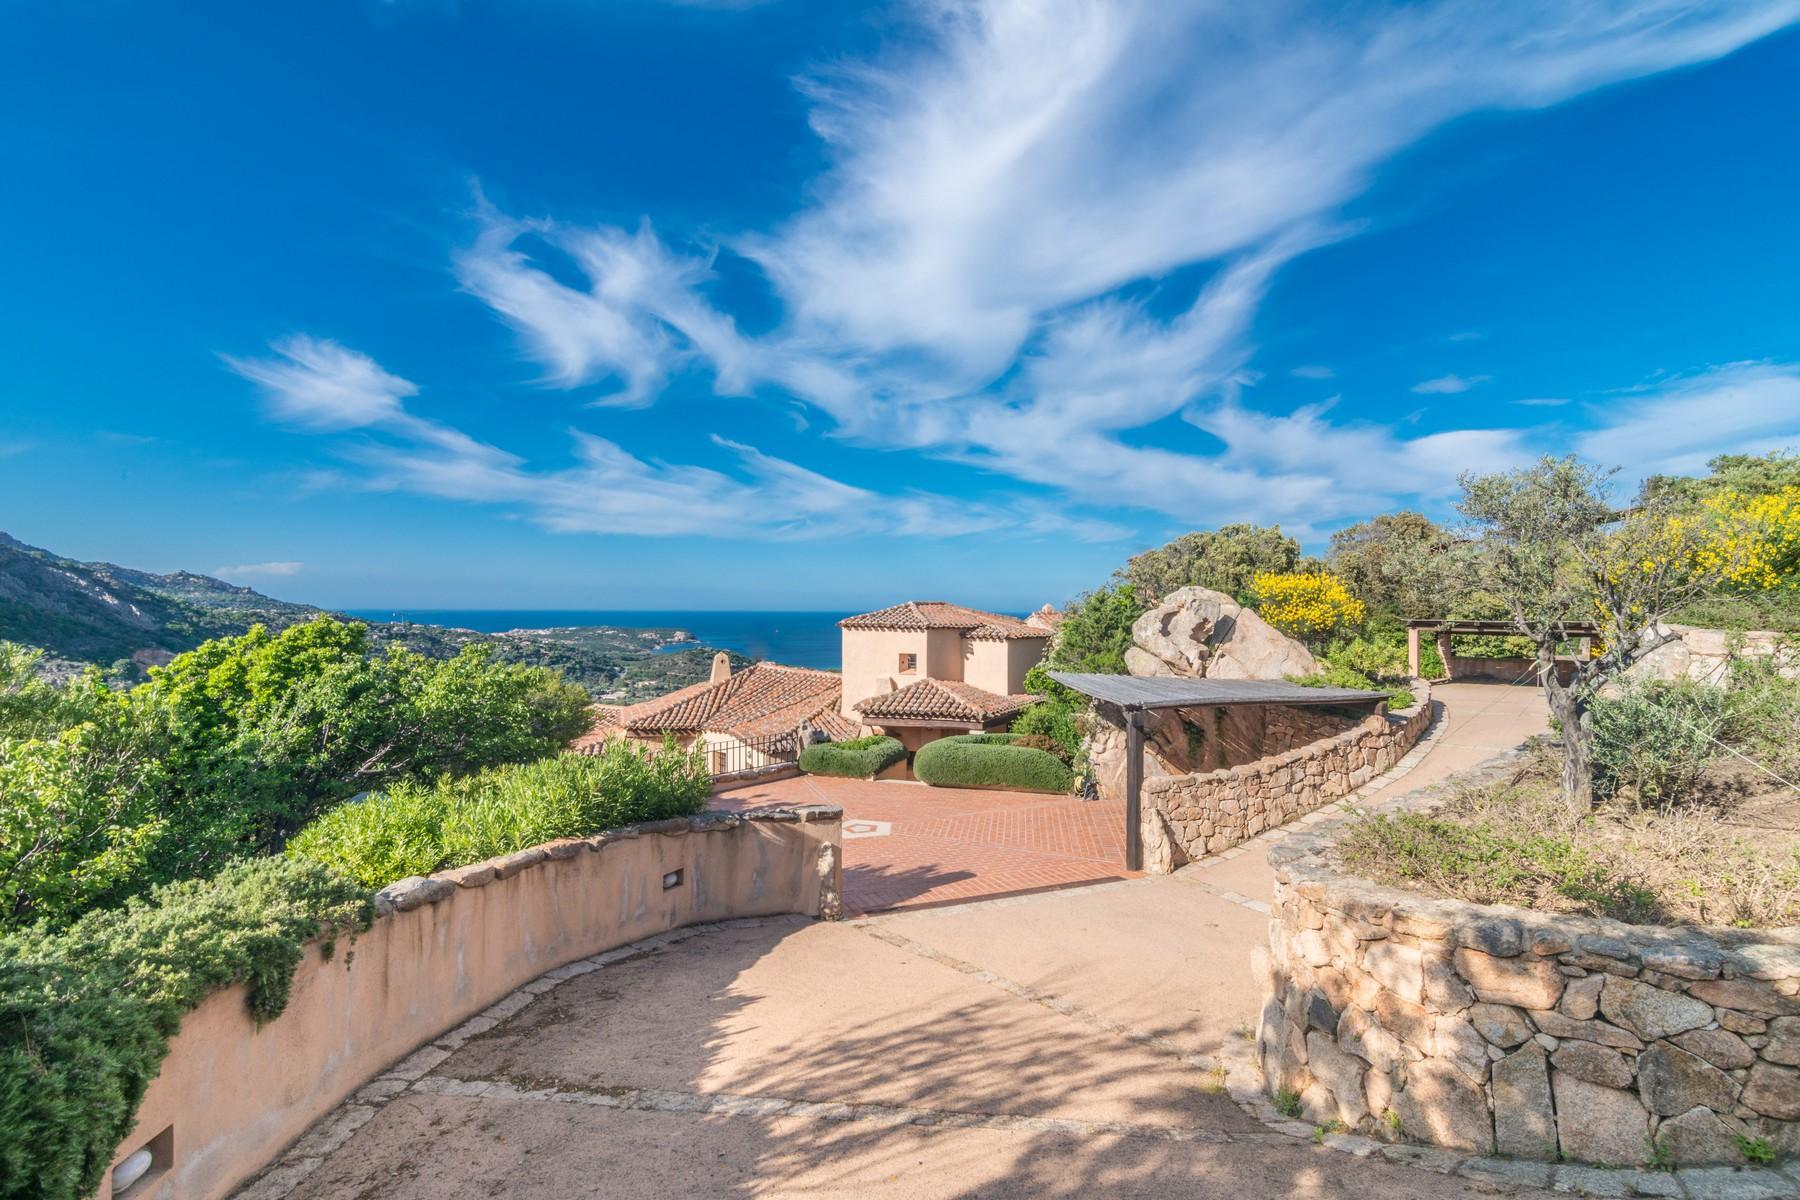 Porto Cervo Abbiadori Splendide villa jumelée avec vue sur le golfe de Pevero - 38